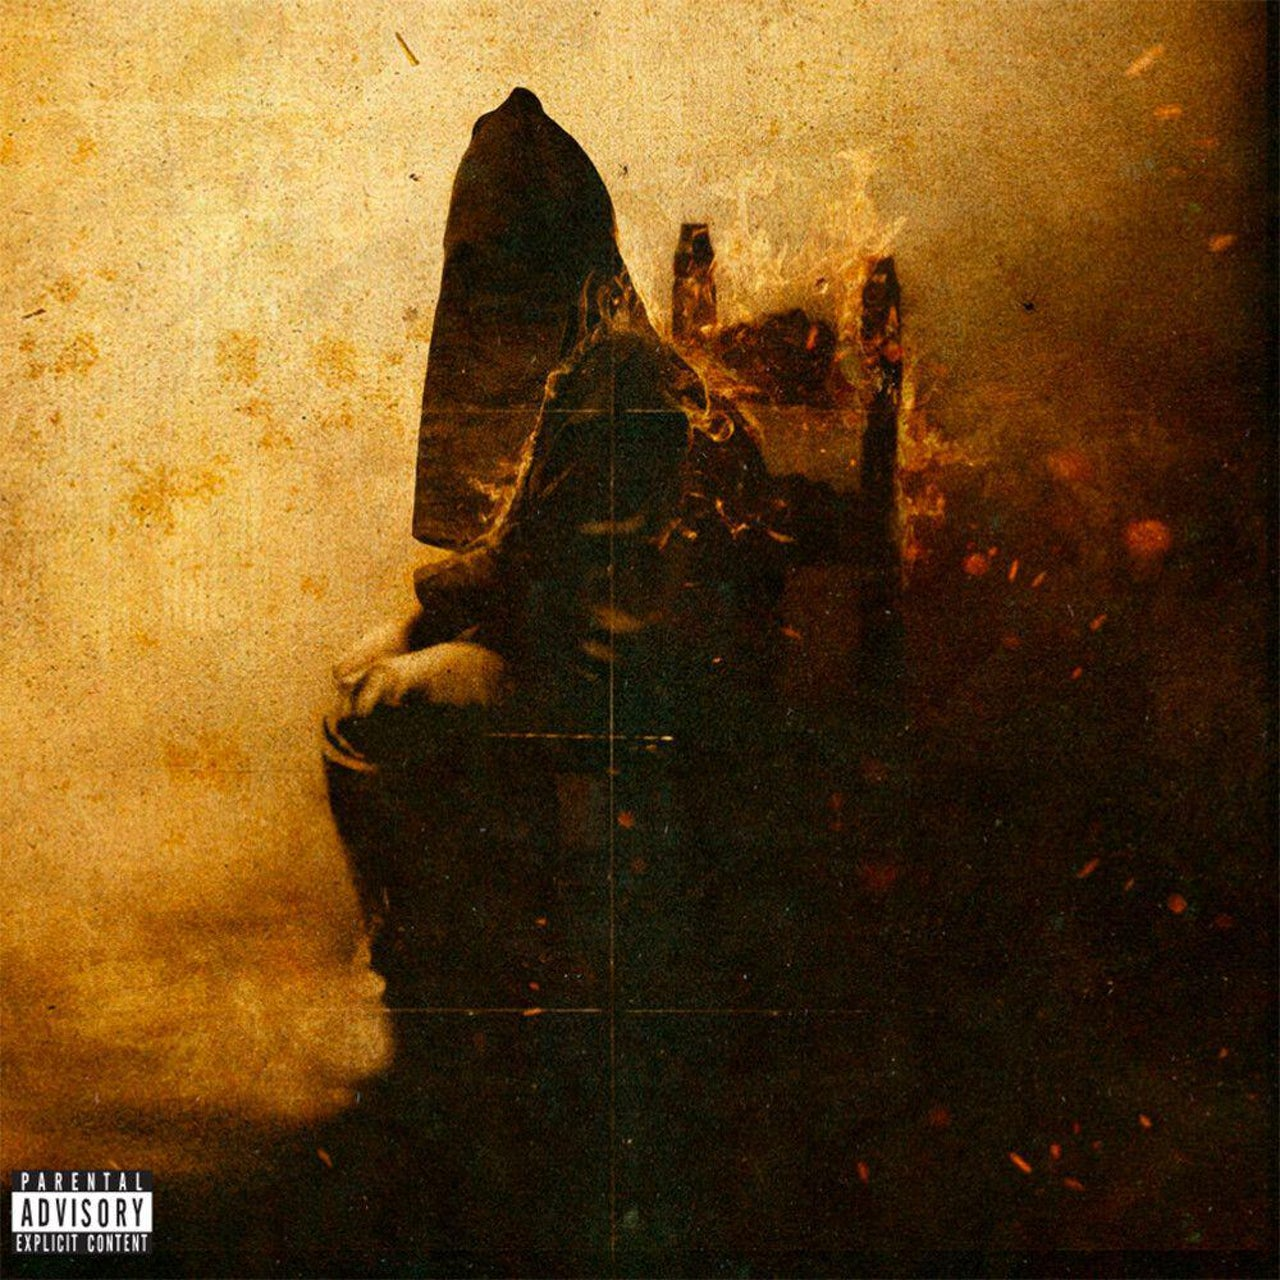 MP3: Vinnie Paz feat. Eto - Murder Takes Time